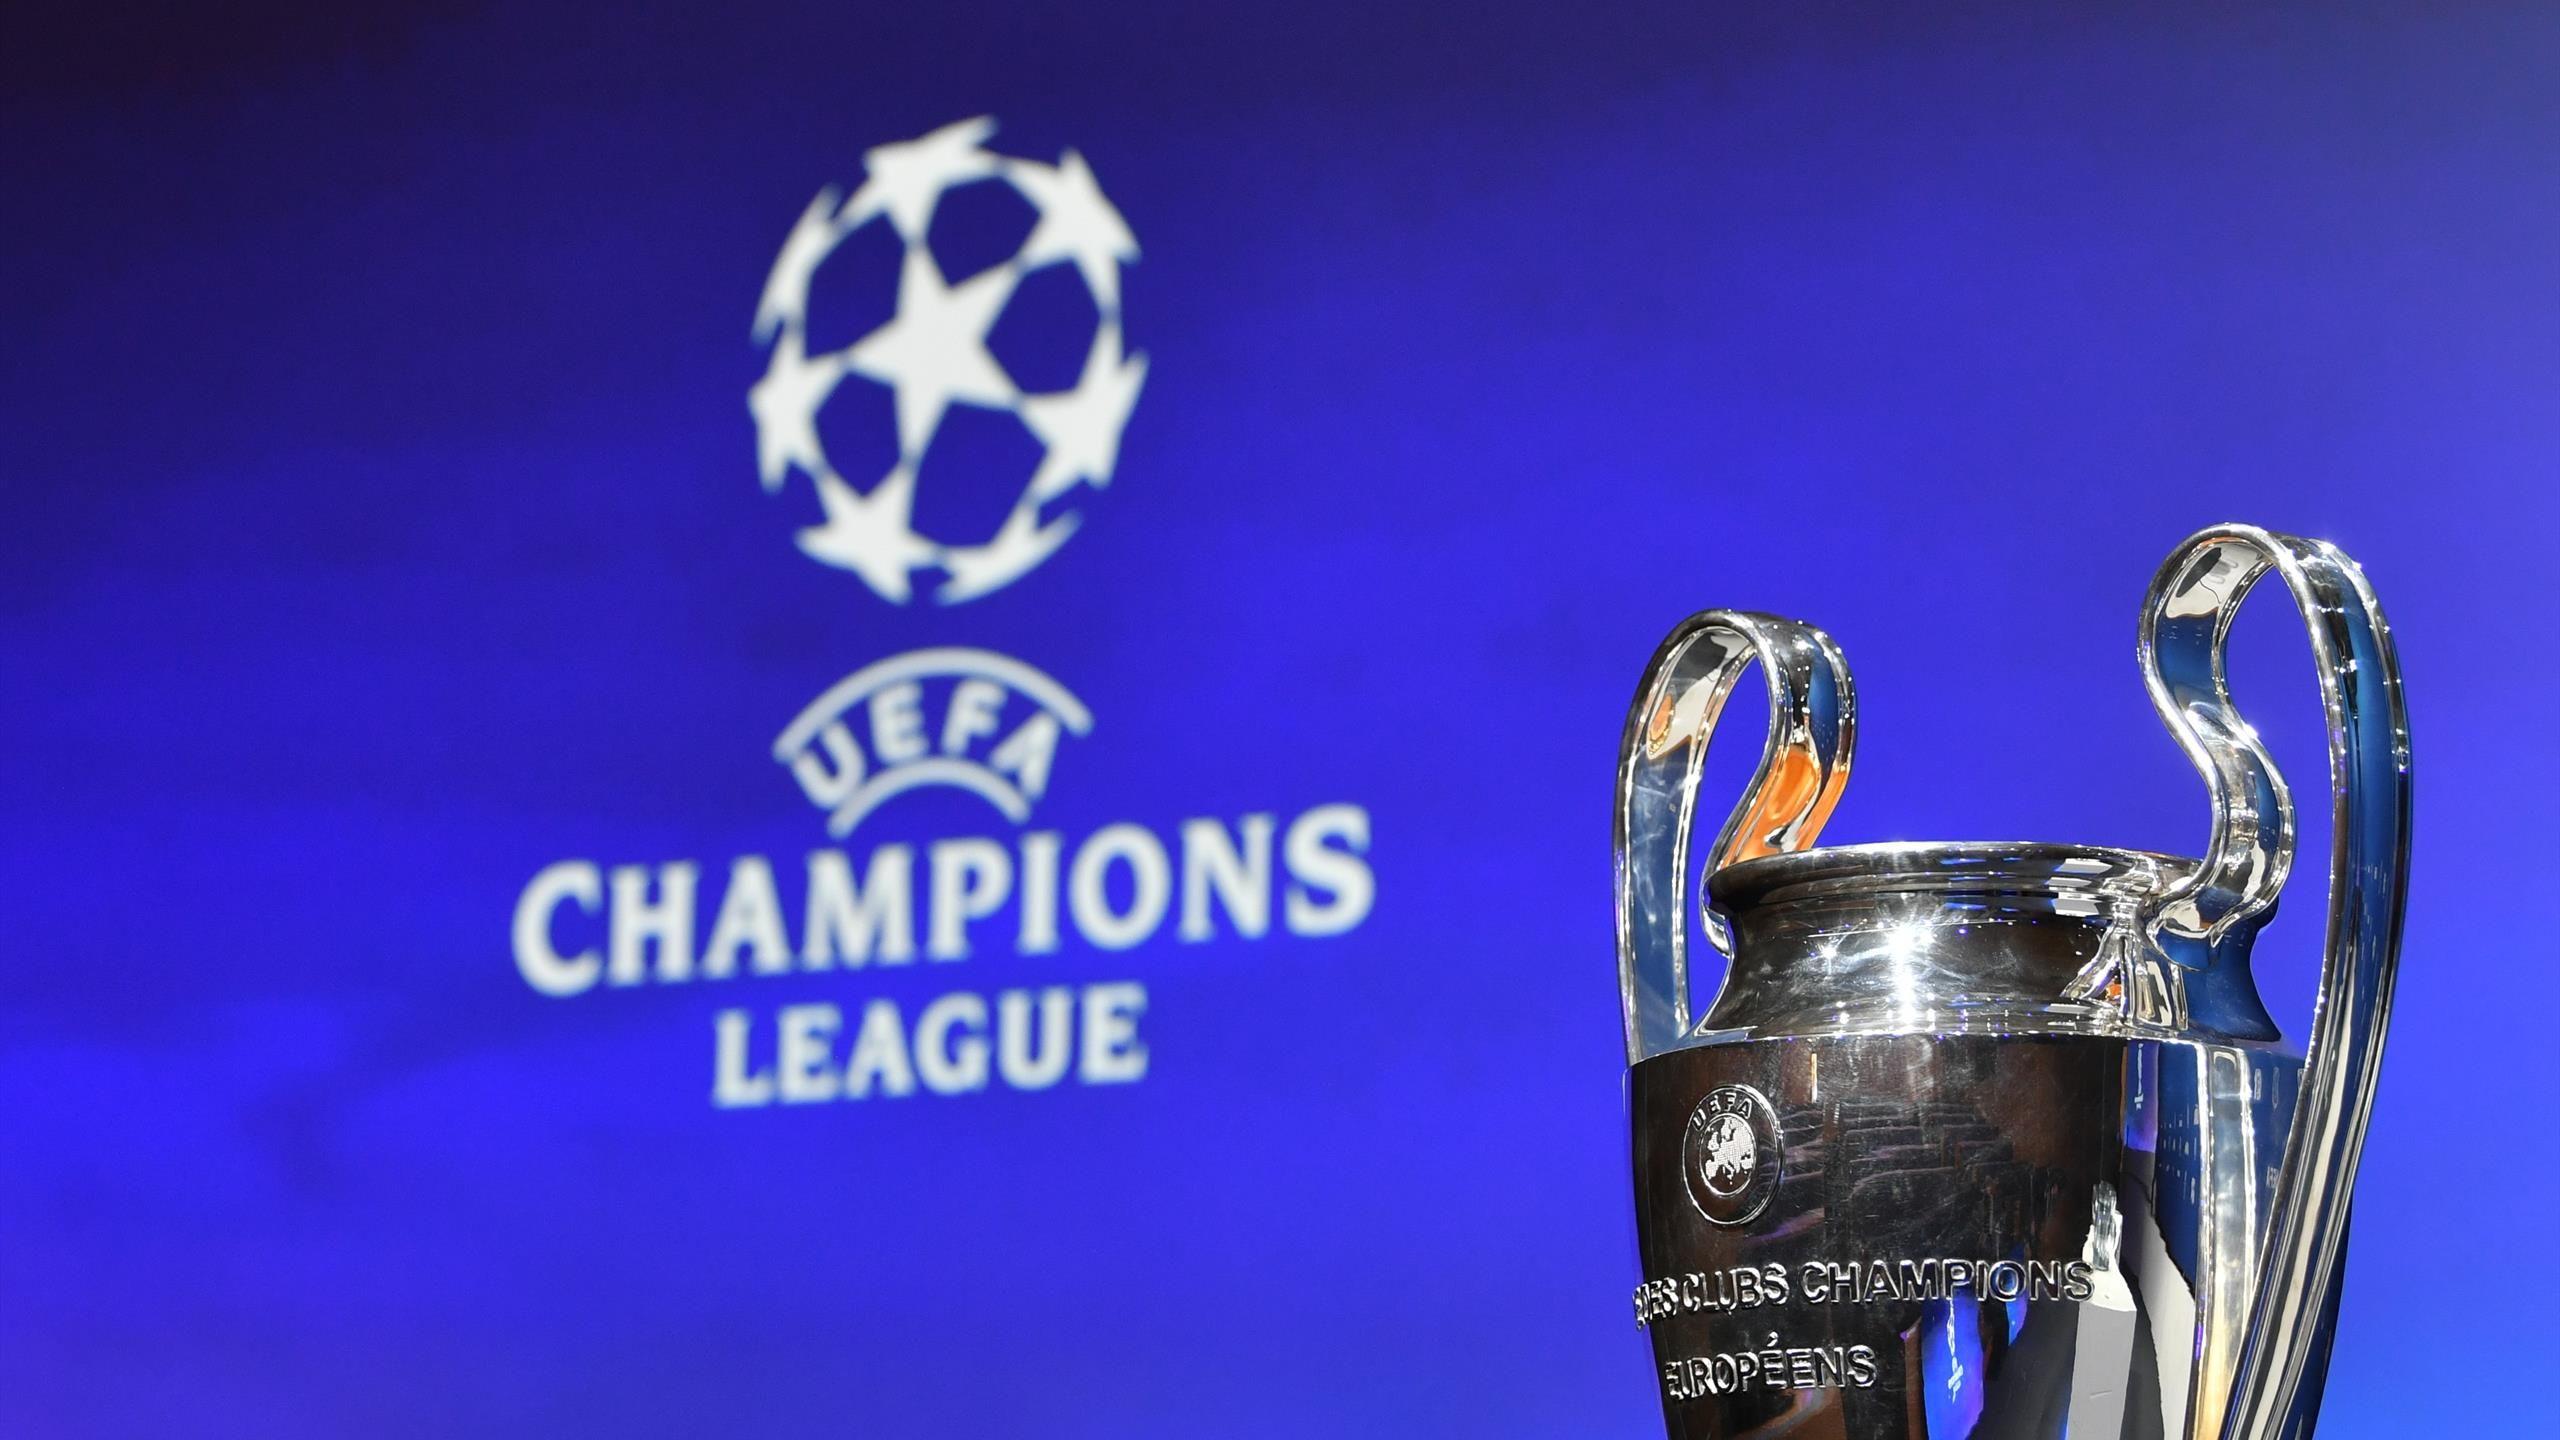 Champions League Uefa sede finali